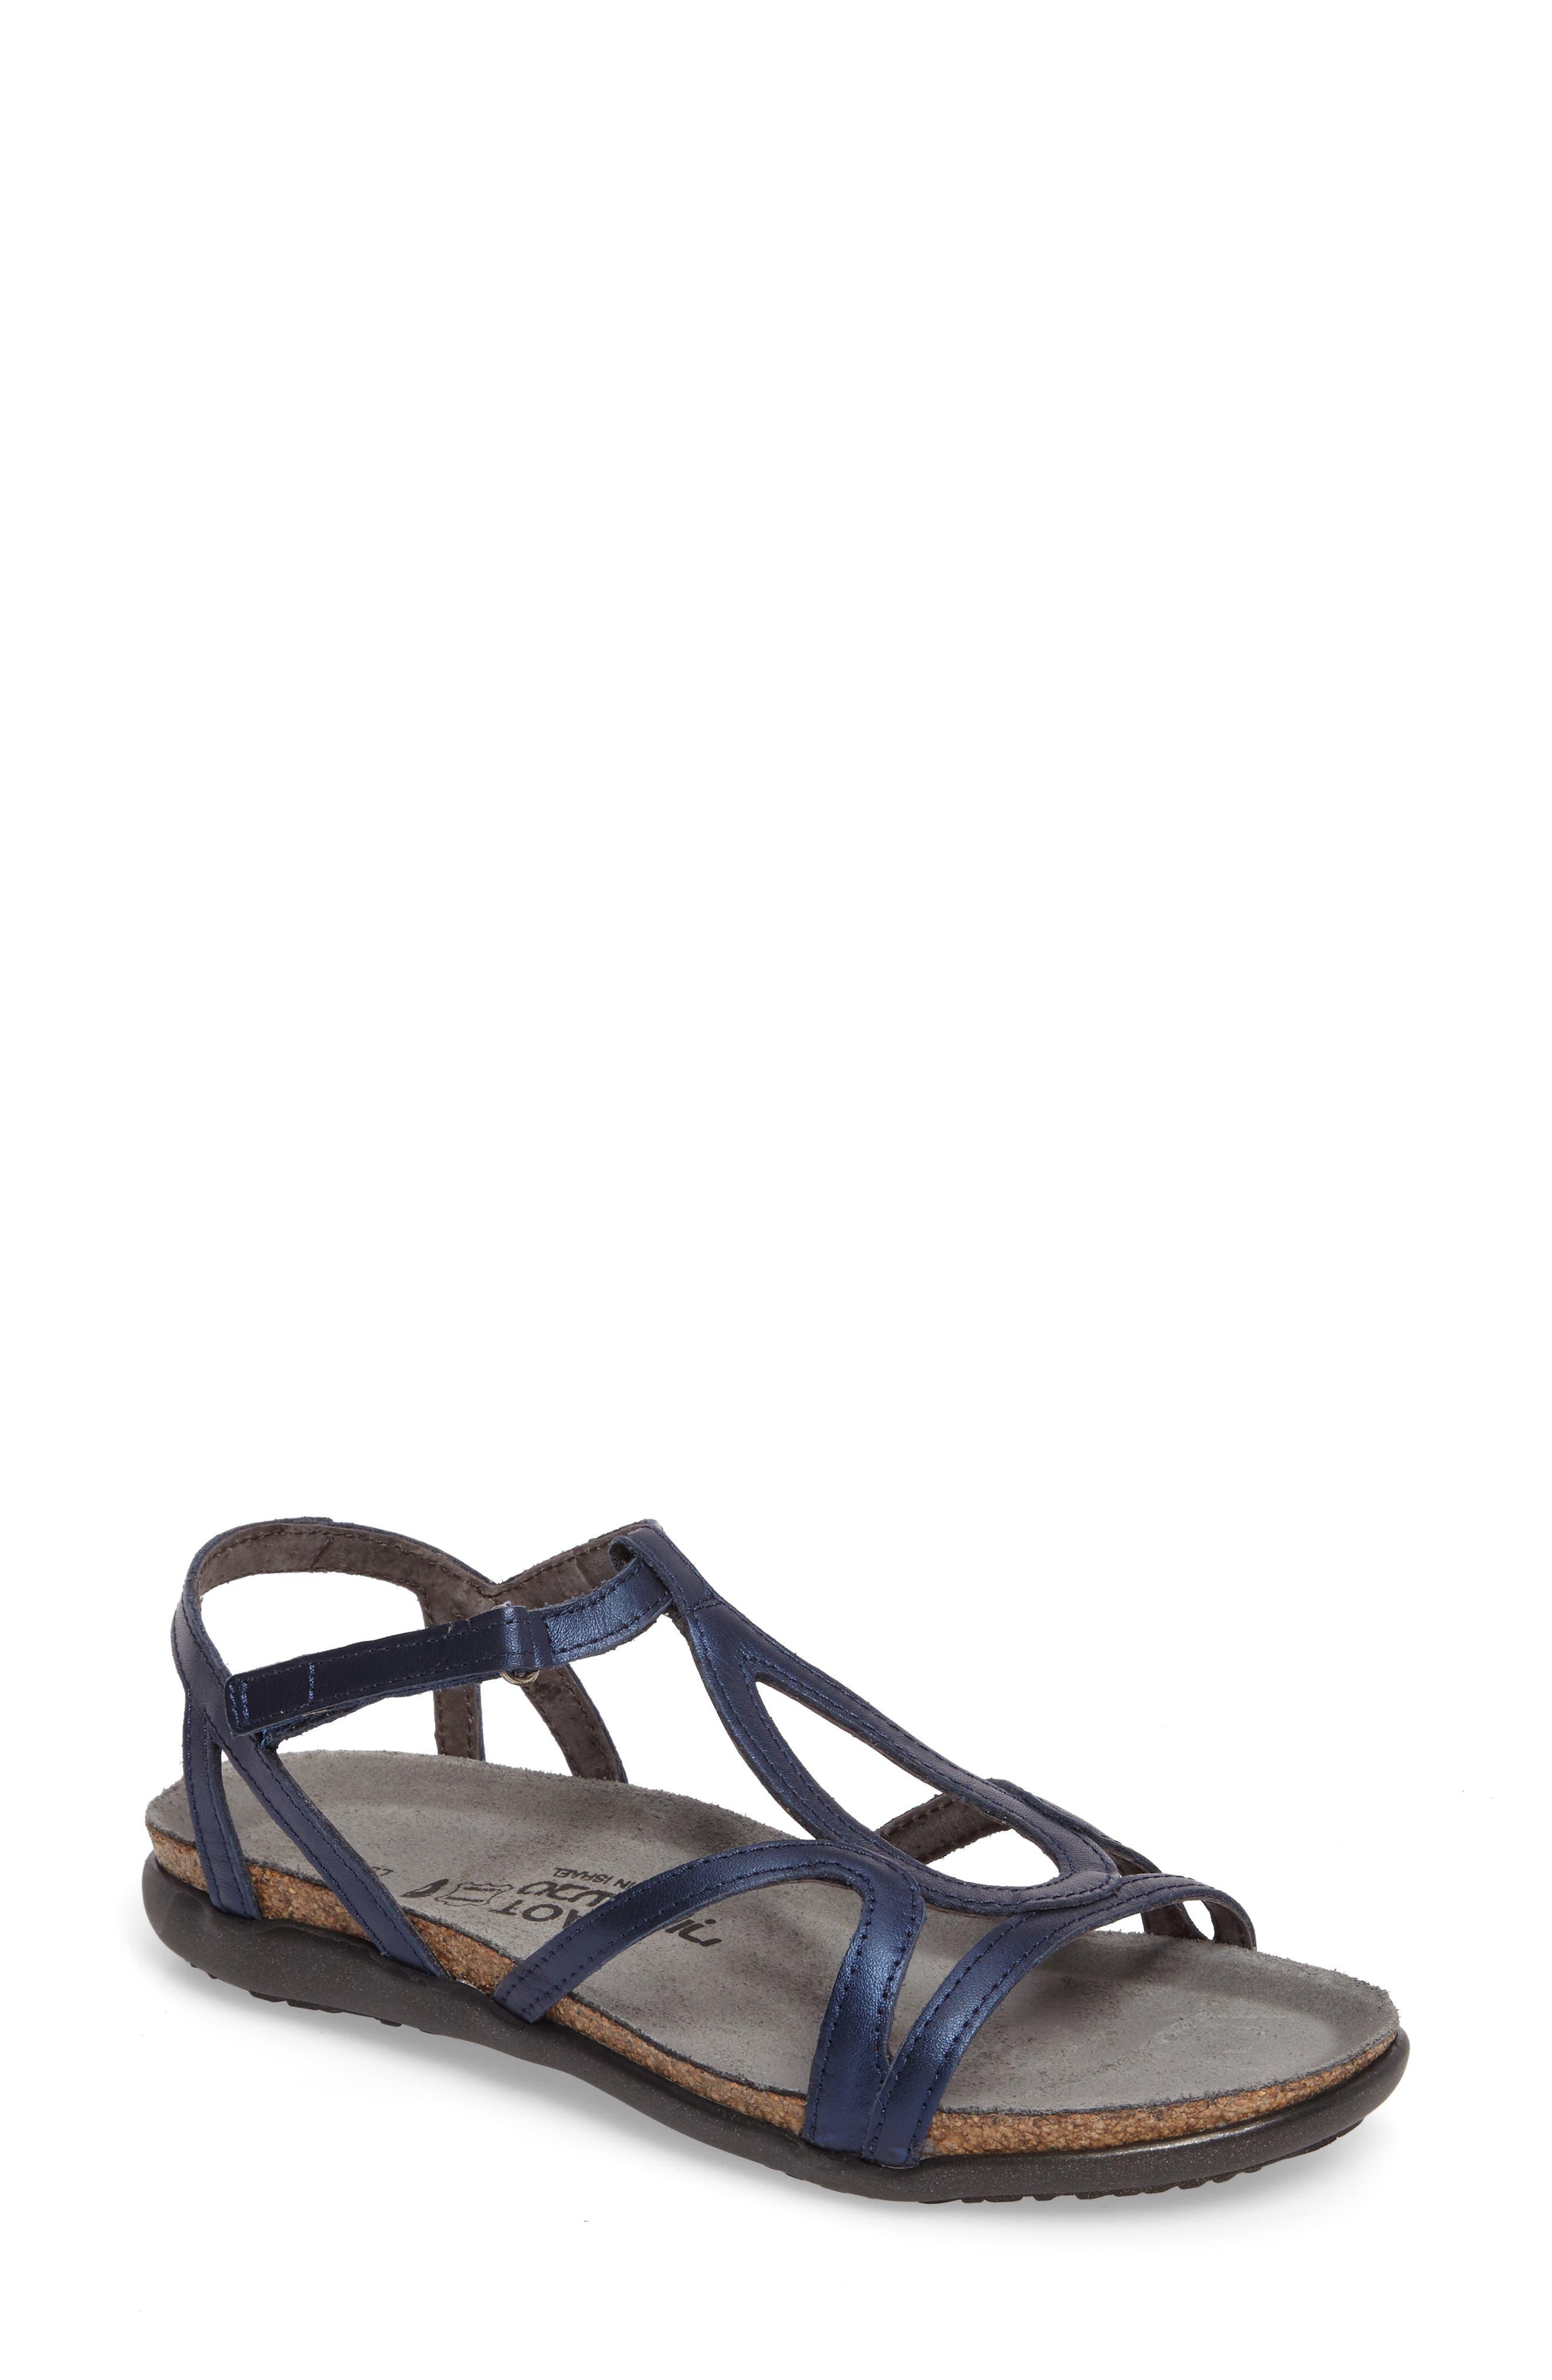 Main Image - Naot 'Dorith' Sandal